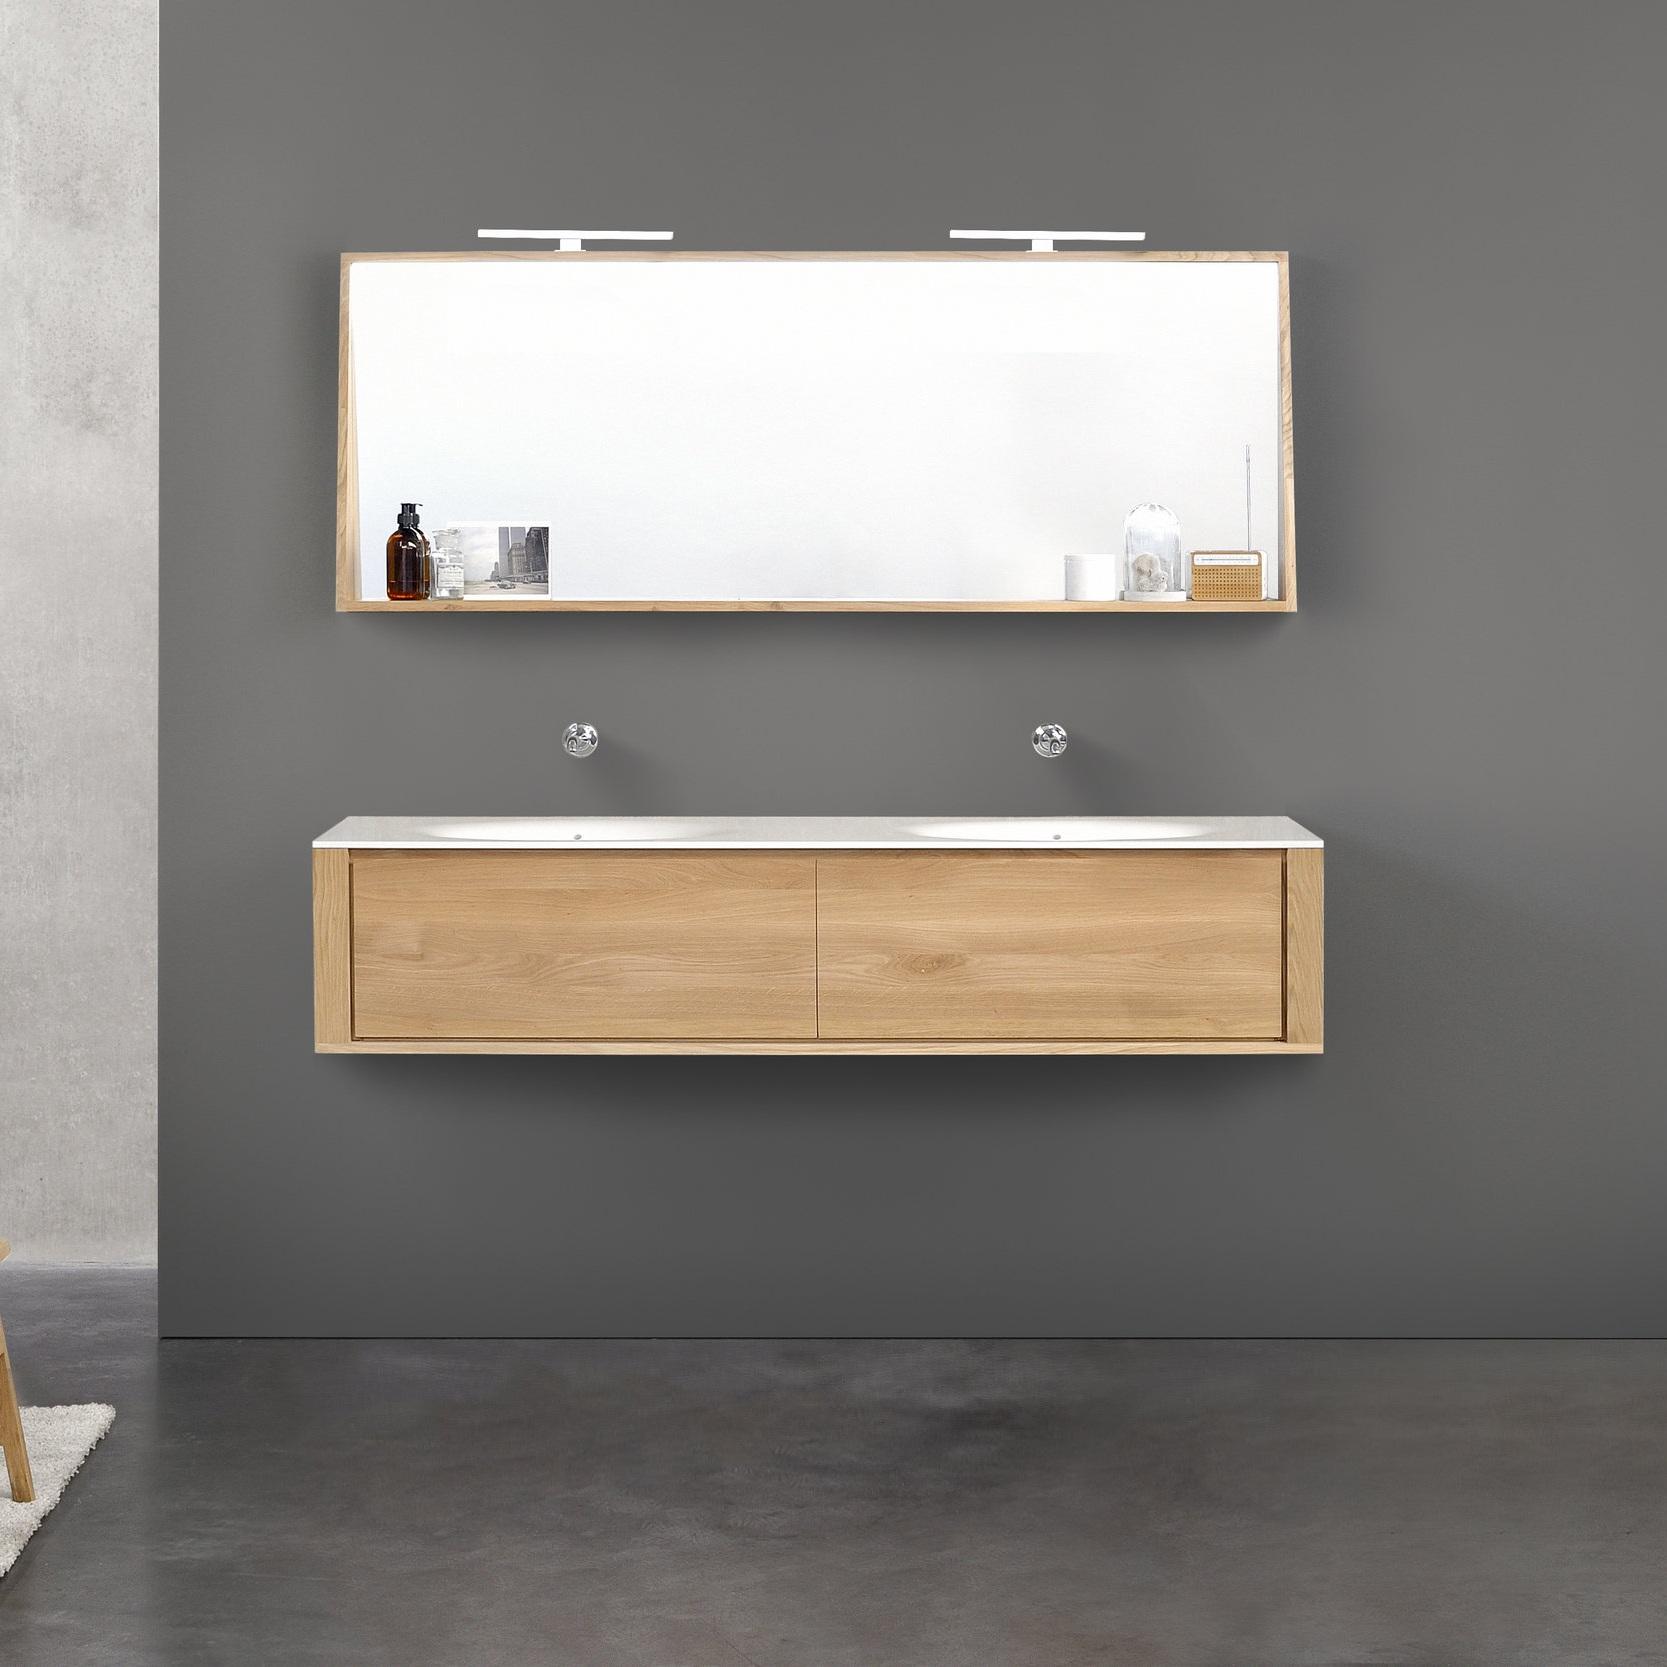 Qualitime-TGO-038017-Corian-top-2-washbasins-TGO-058076-mirror-3_edt.jpg